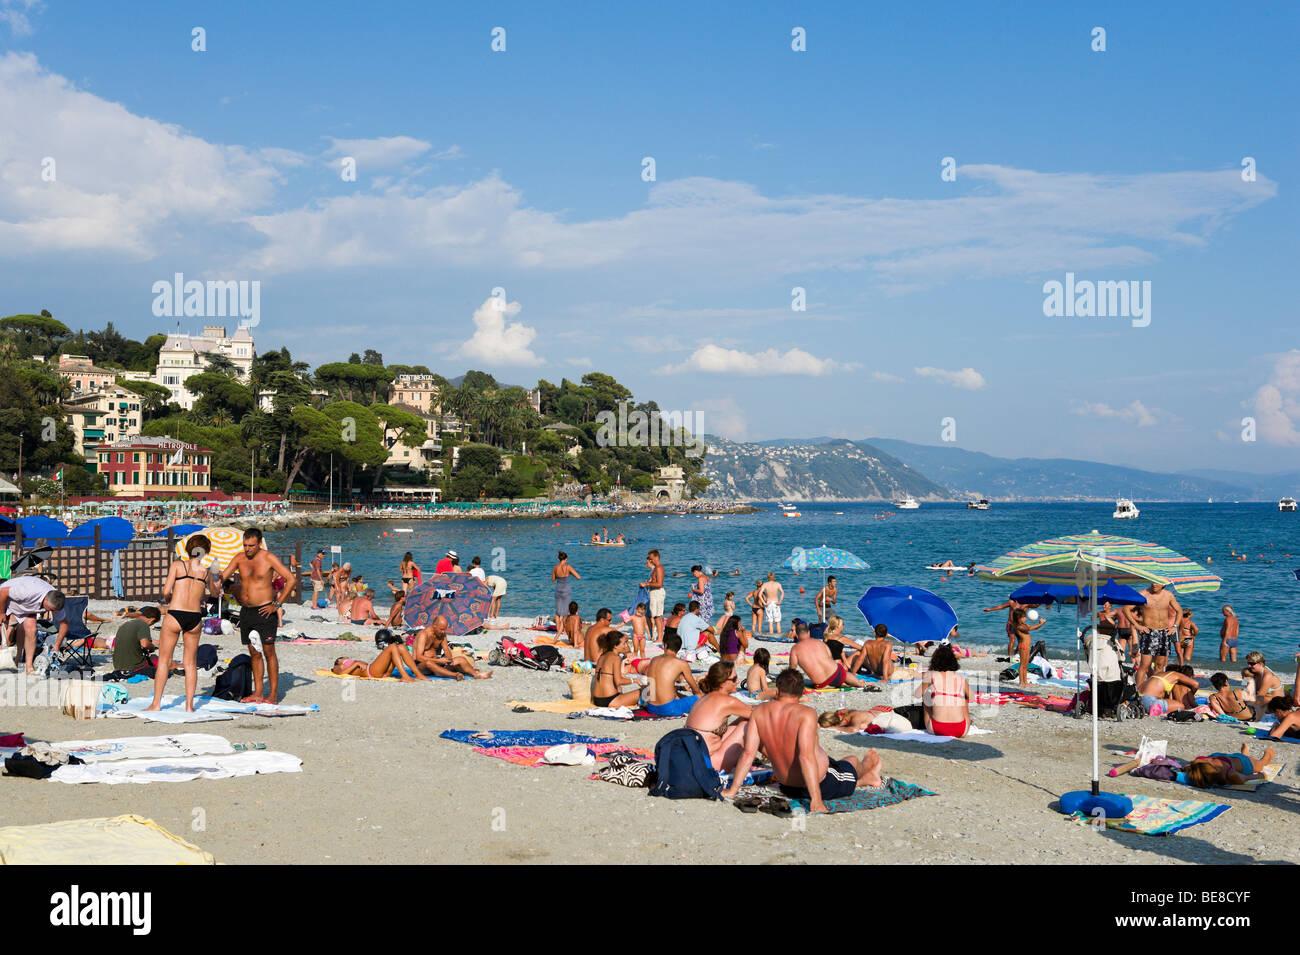 Beach at Santa Margherita Ligure in the late afternoon, Golfo del Tigullio, Italian Riviera, Liguria, Italy Stock Photo